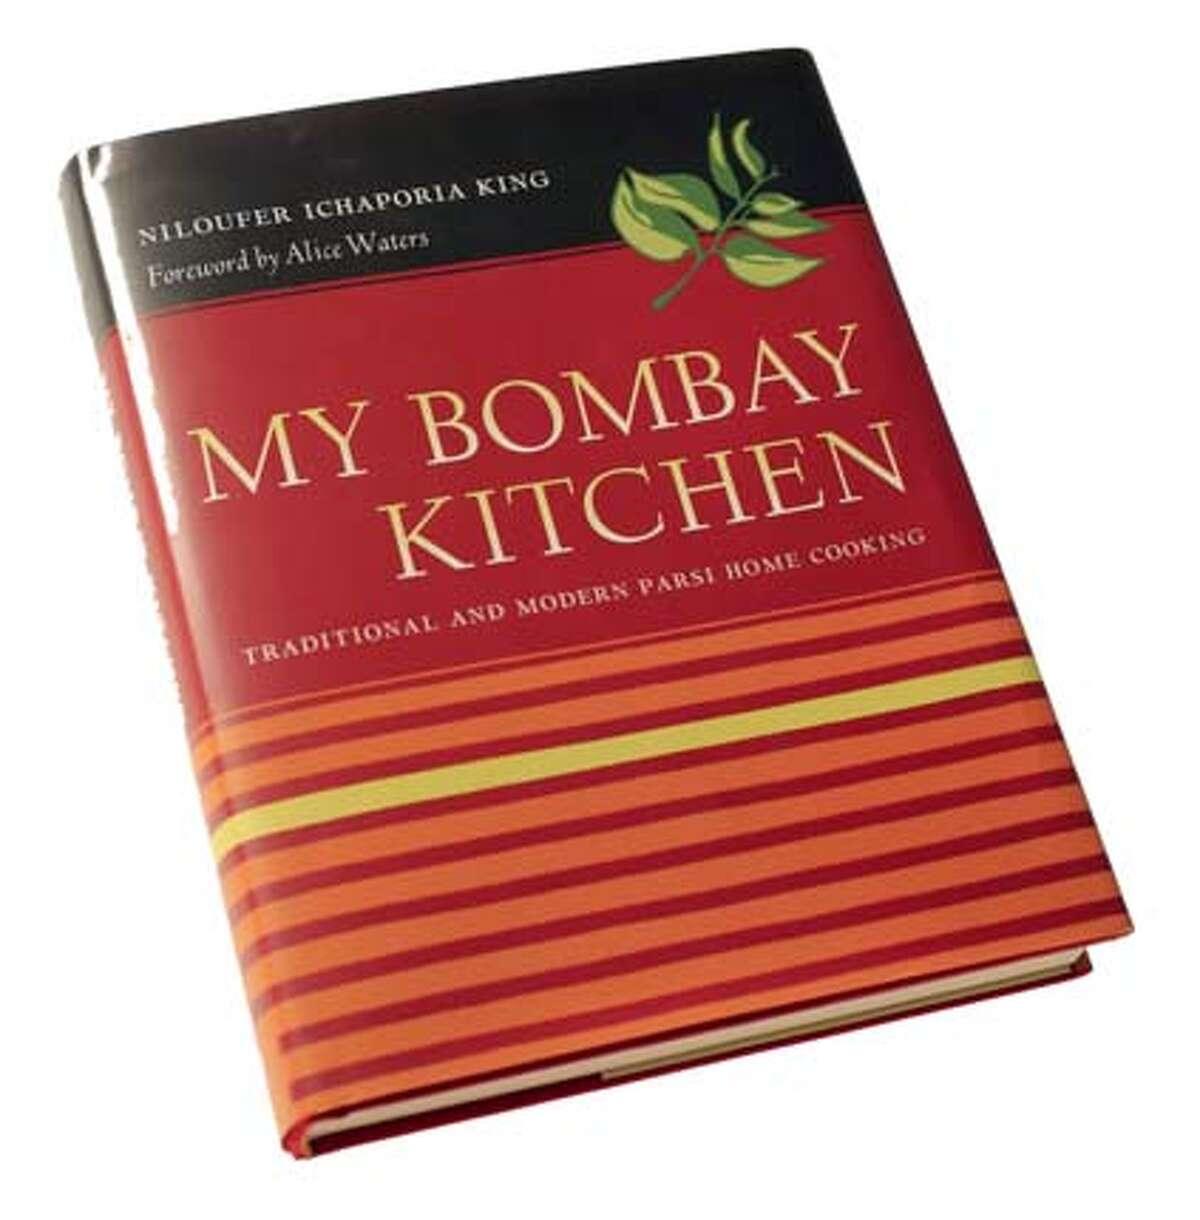 BOOK11_BOMBAY_JOHNLEE.JPG